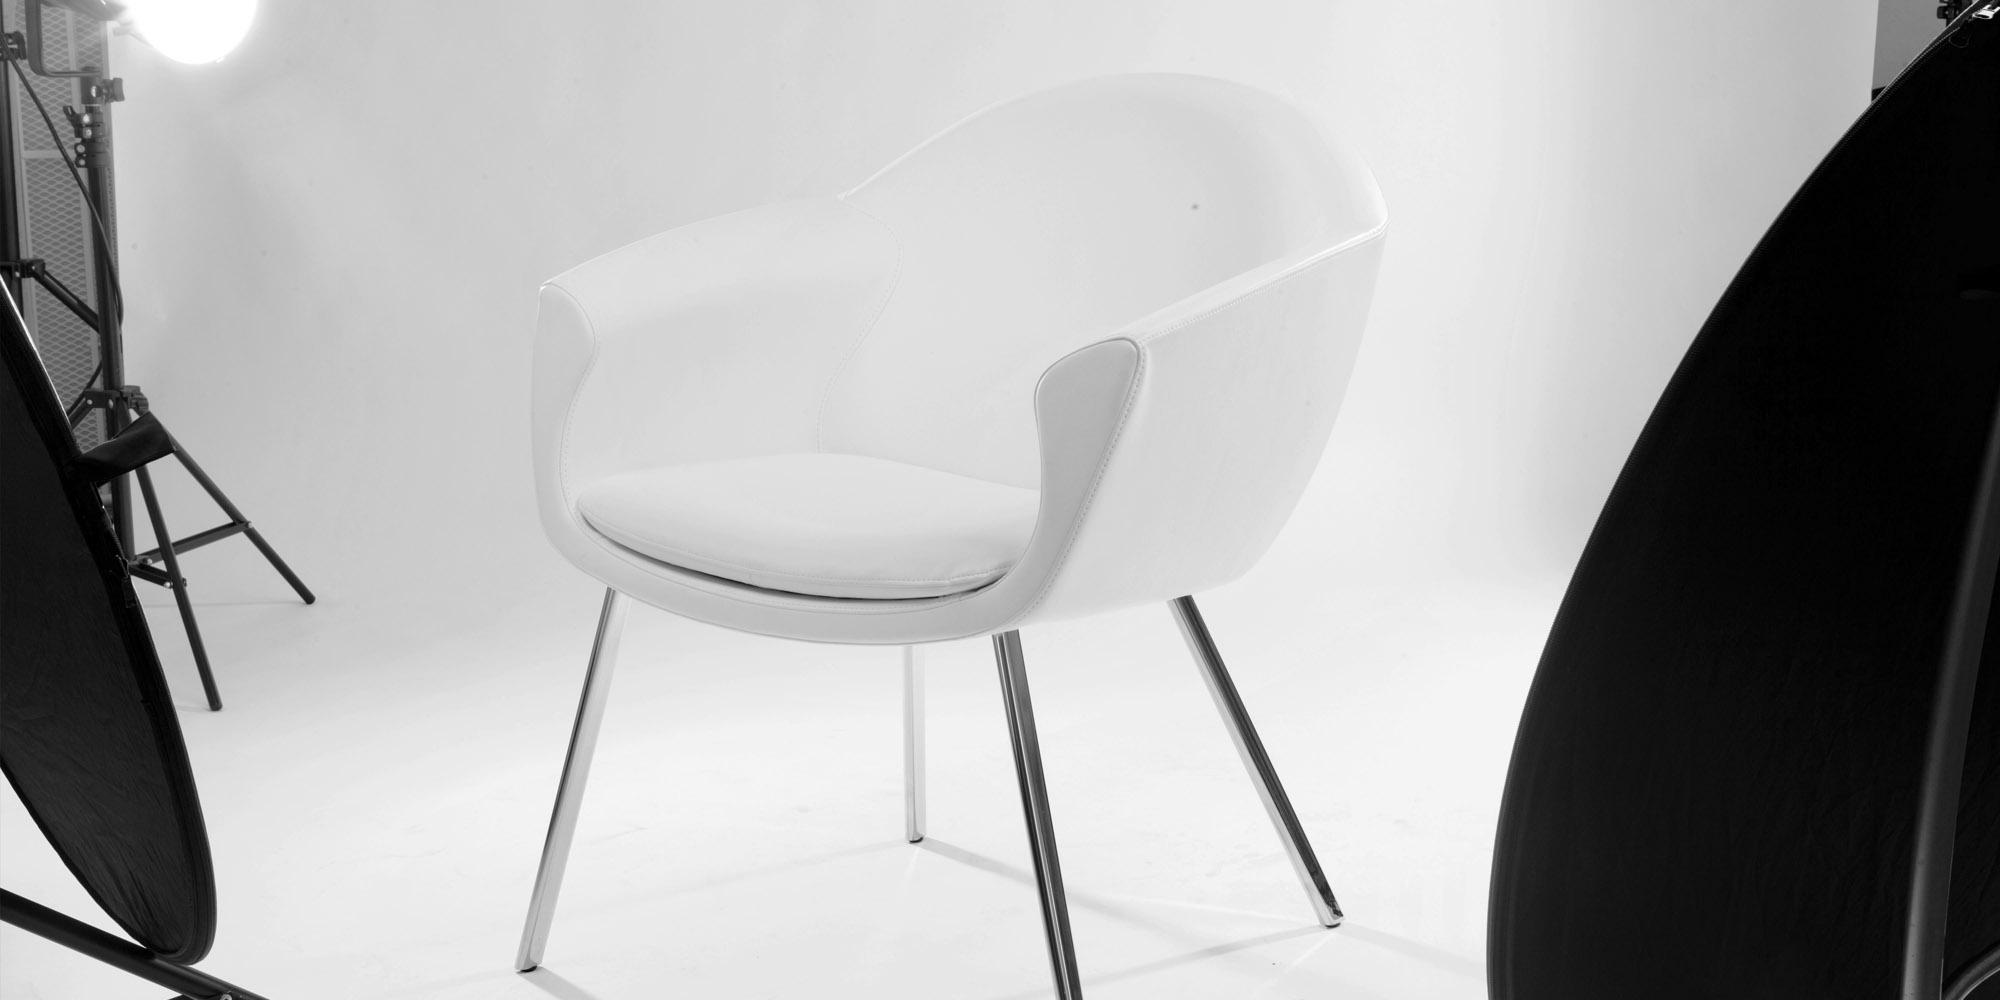 Jones-and-Partners-Mortimer-seating-armchair-photoshoot.jpg